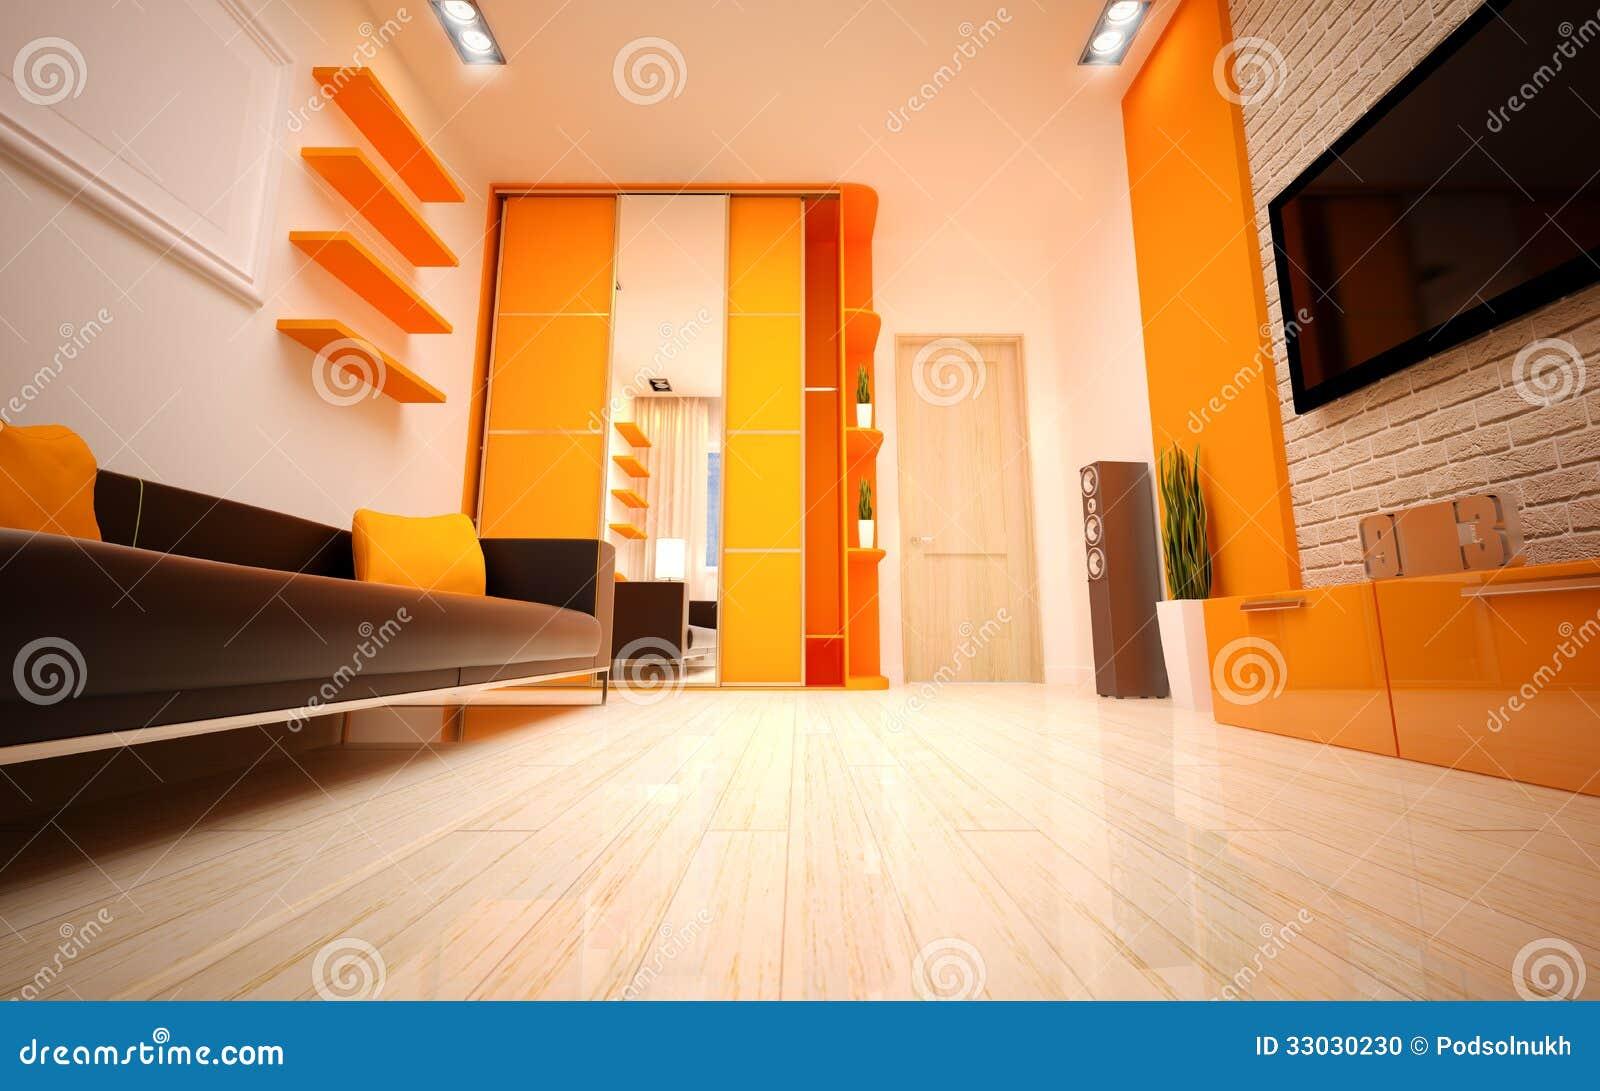 Interior design modern living room stock photo image for Interior design living room orange